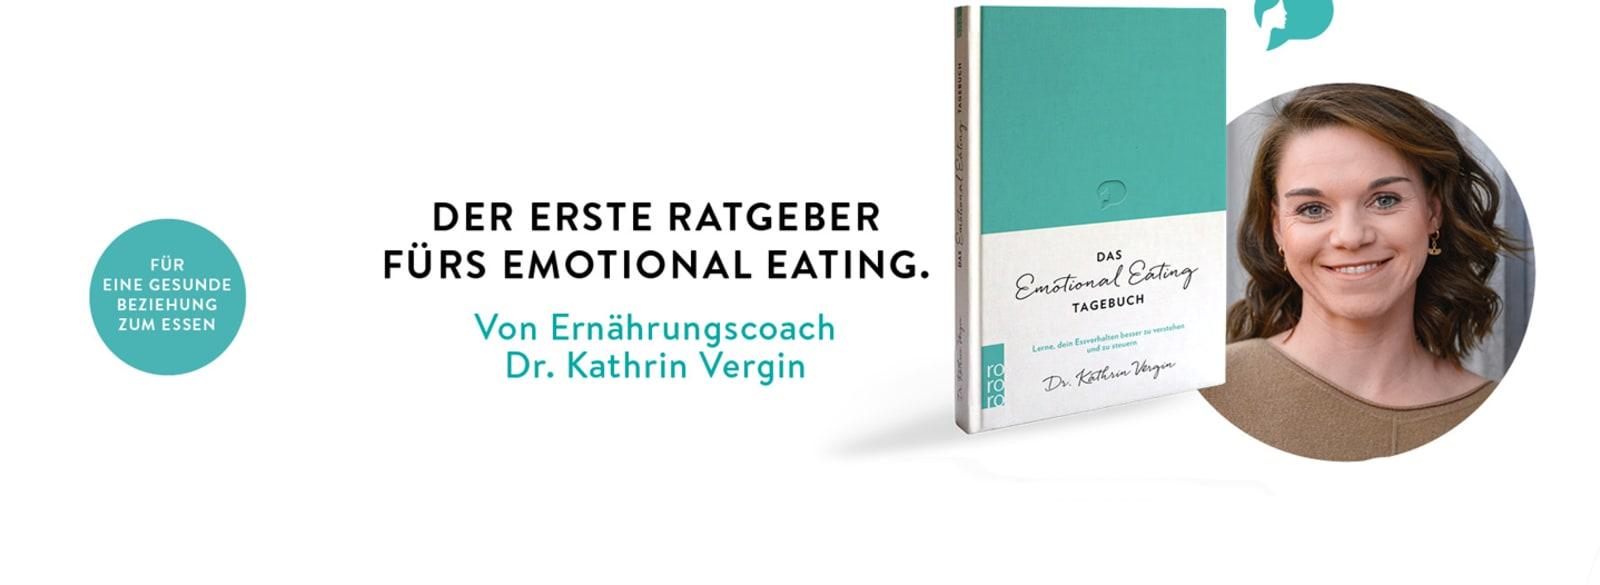 Banner zu «Emotional Eating»